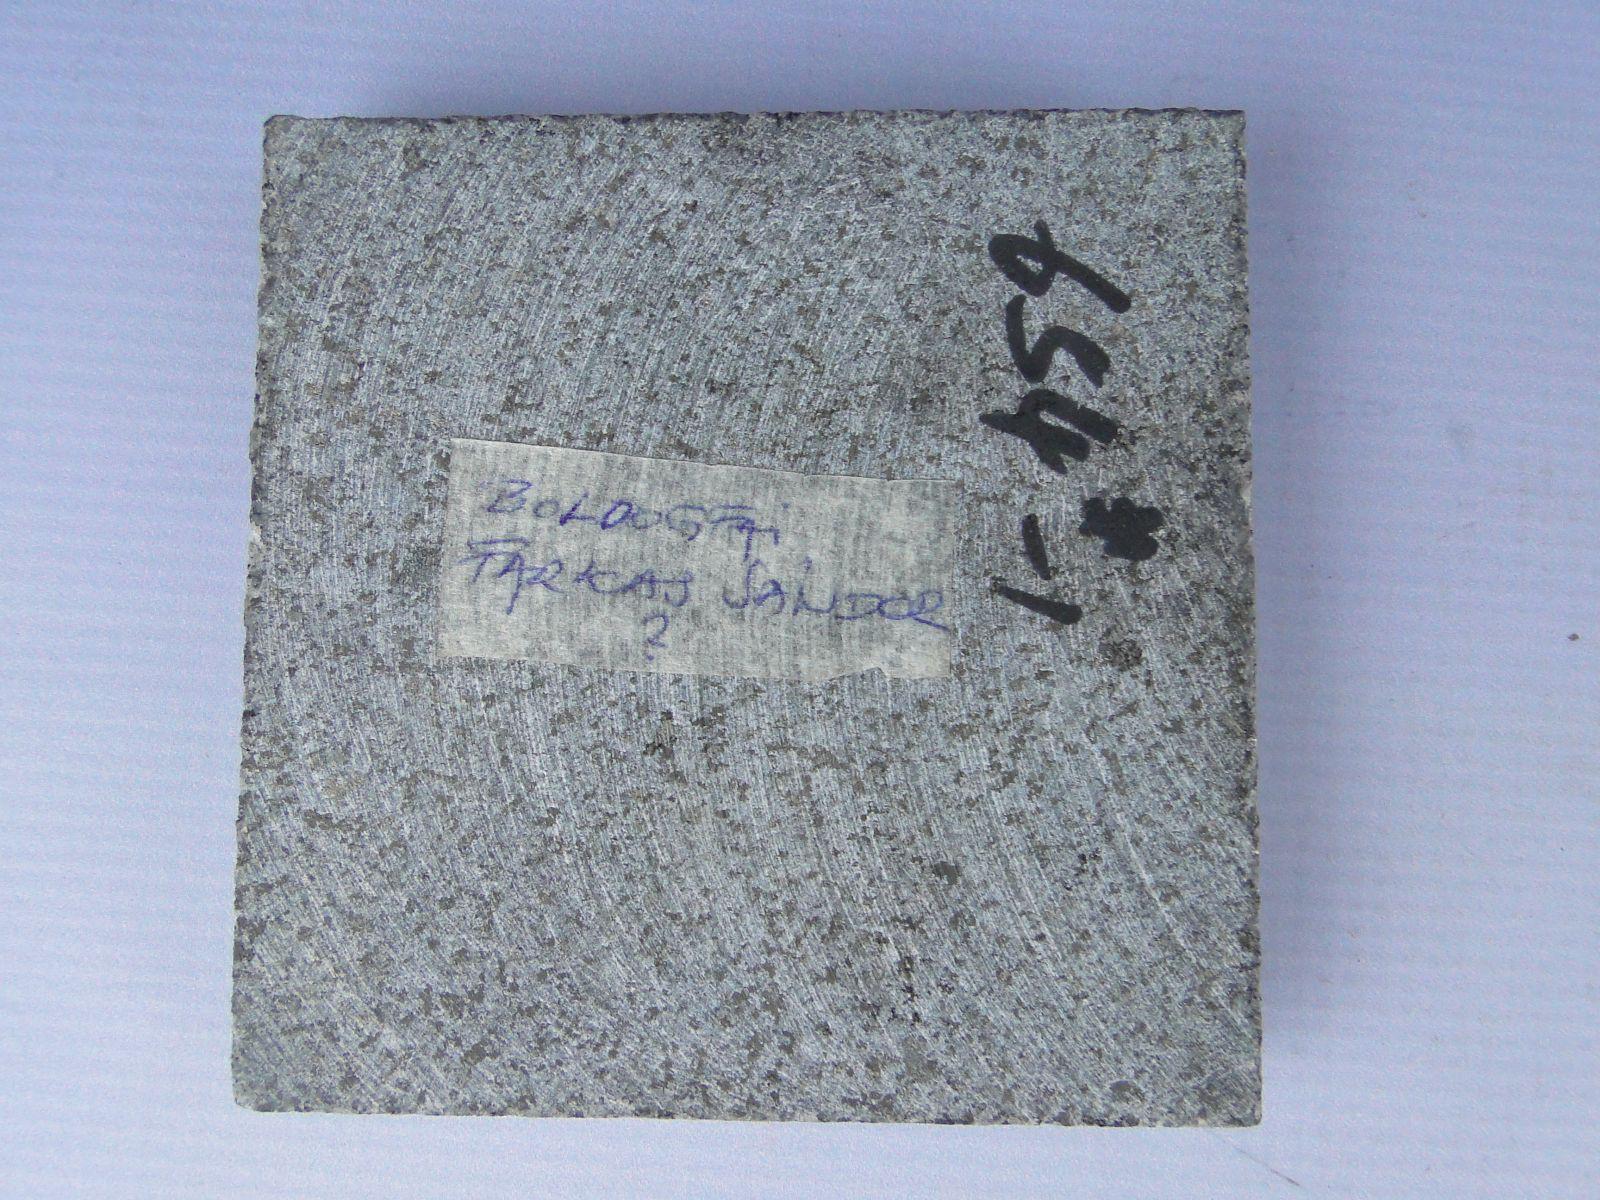 DSC07359.JPG (1600�1200)